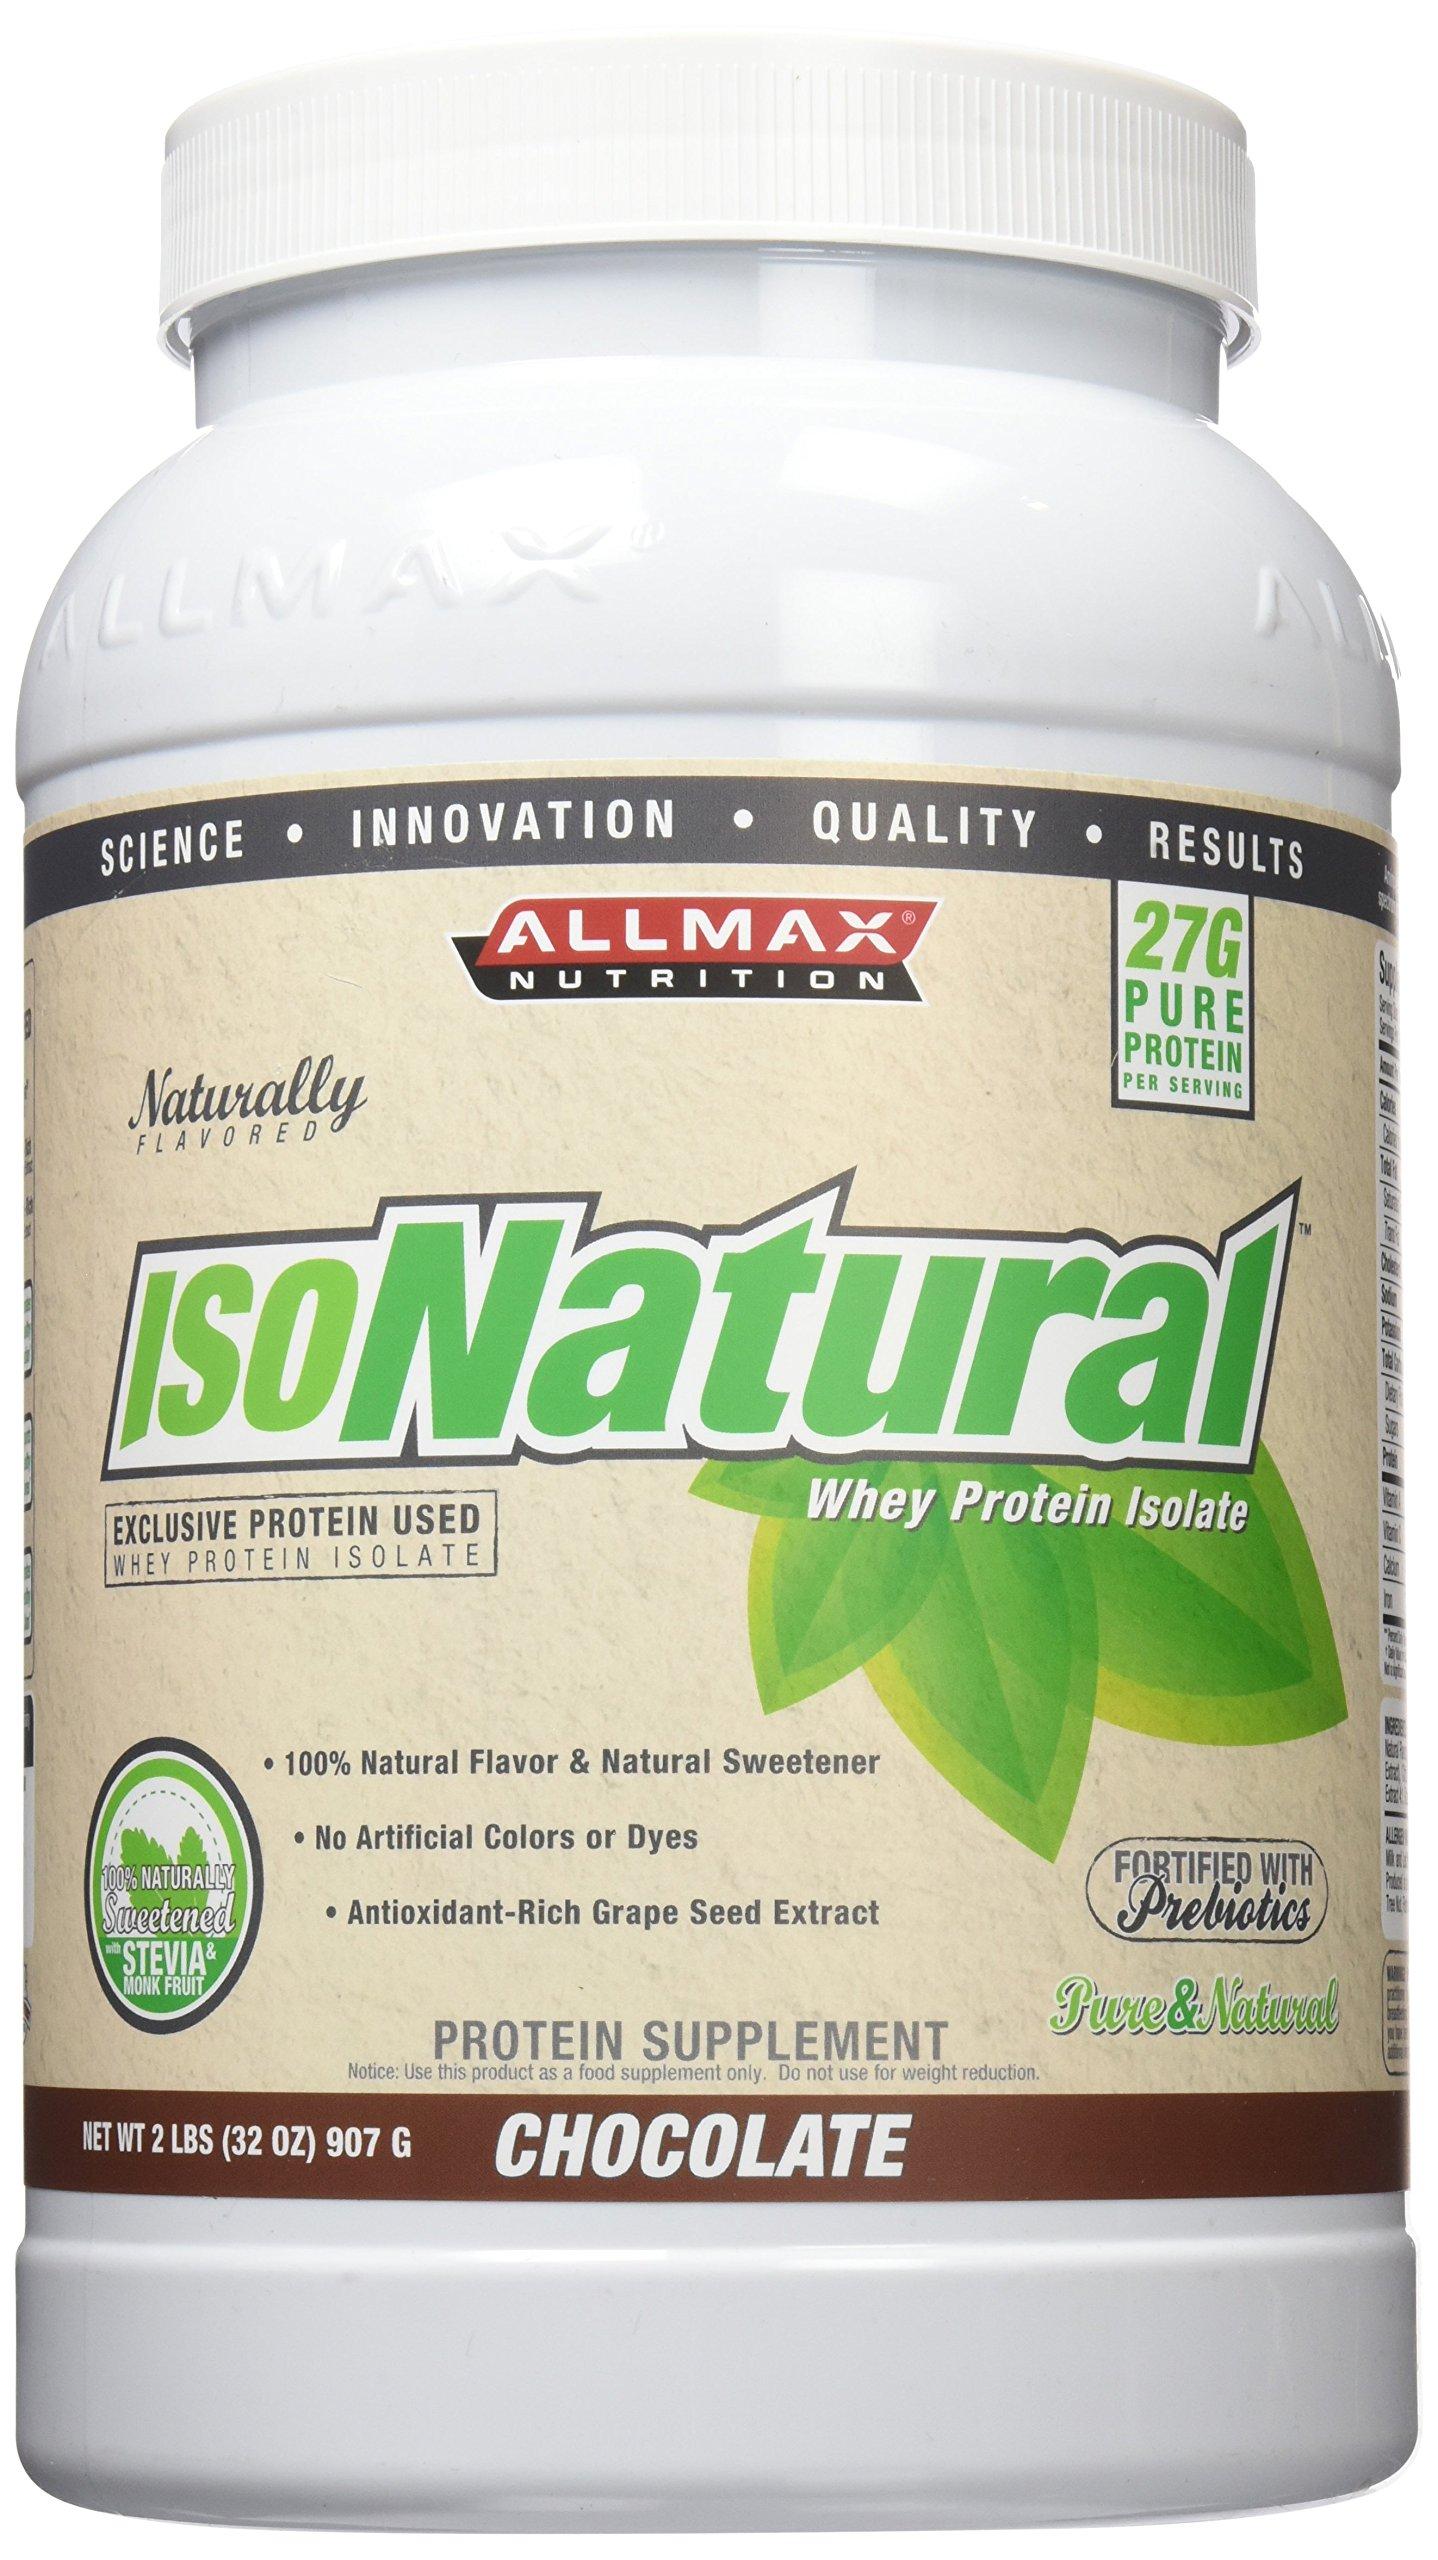 Allmax Nutrition Isonatural Protein Chocolate Flavor,NET WT 2 LBS(32OZ) 907G